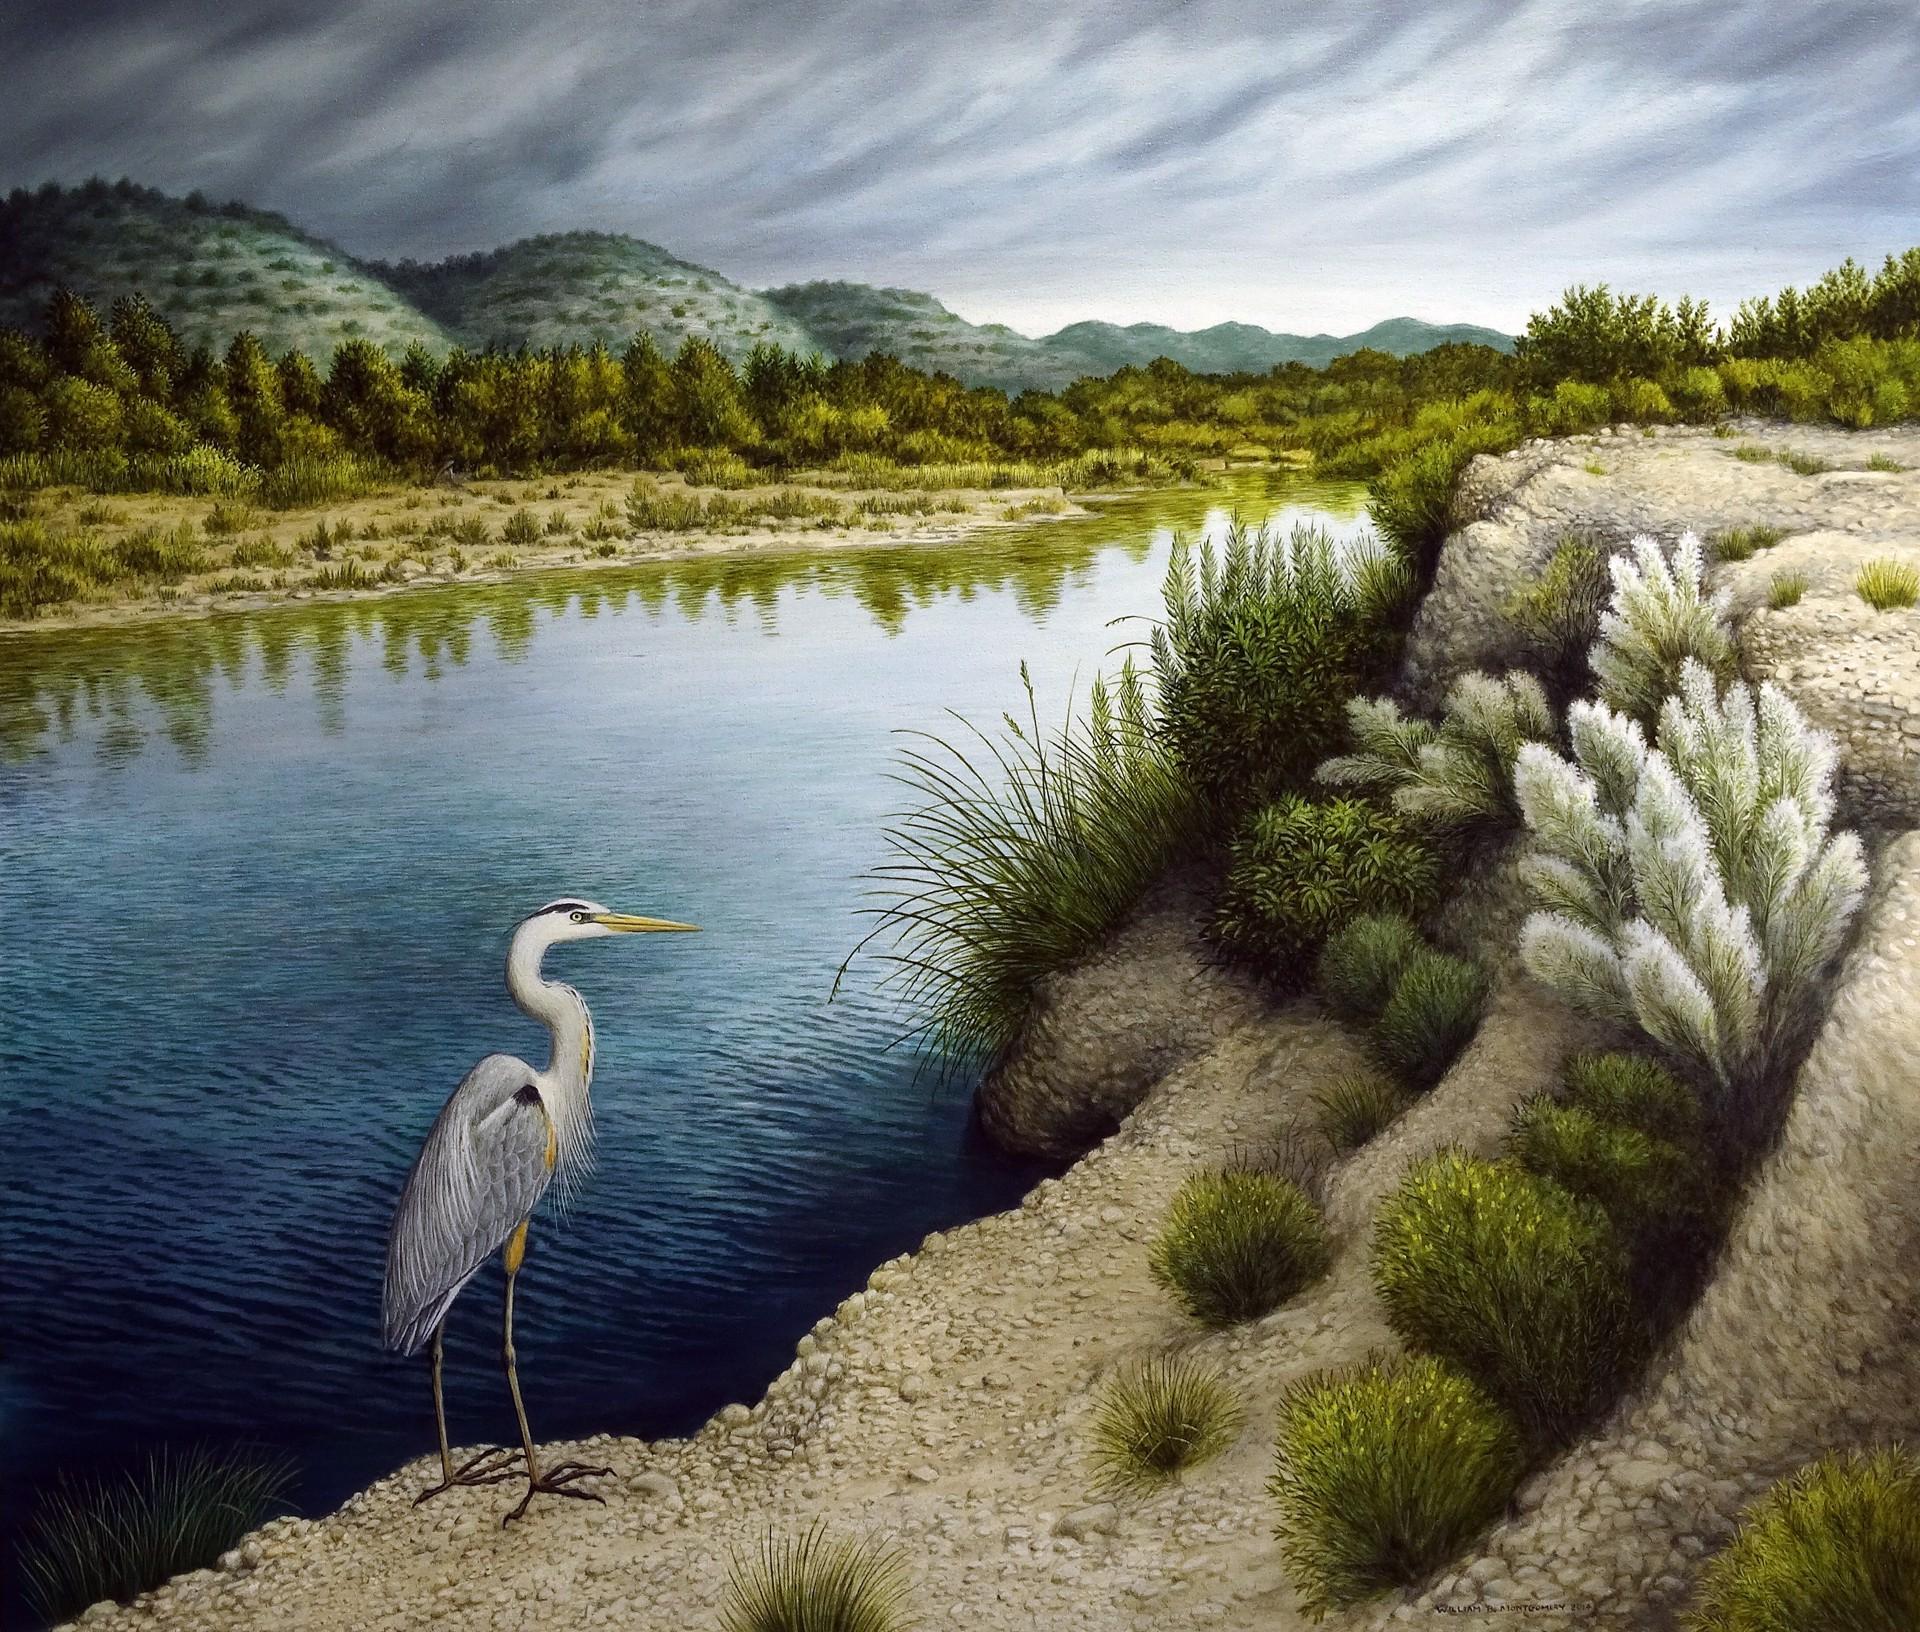 Upper Nueces River by William B. Montgomery